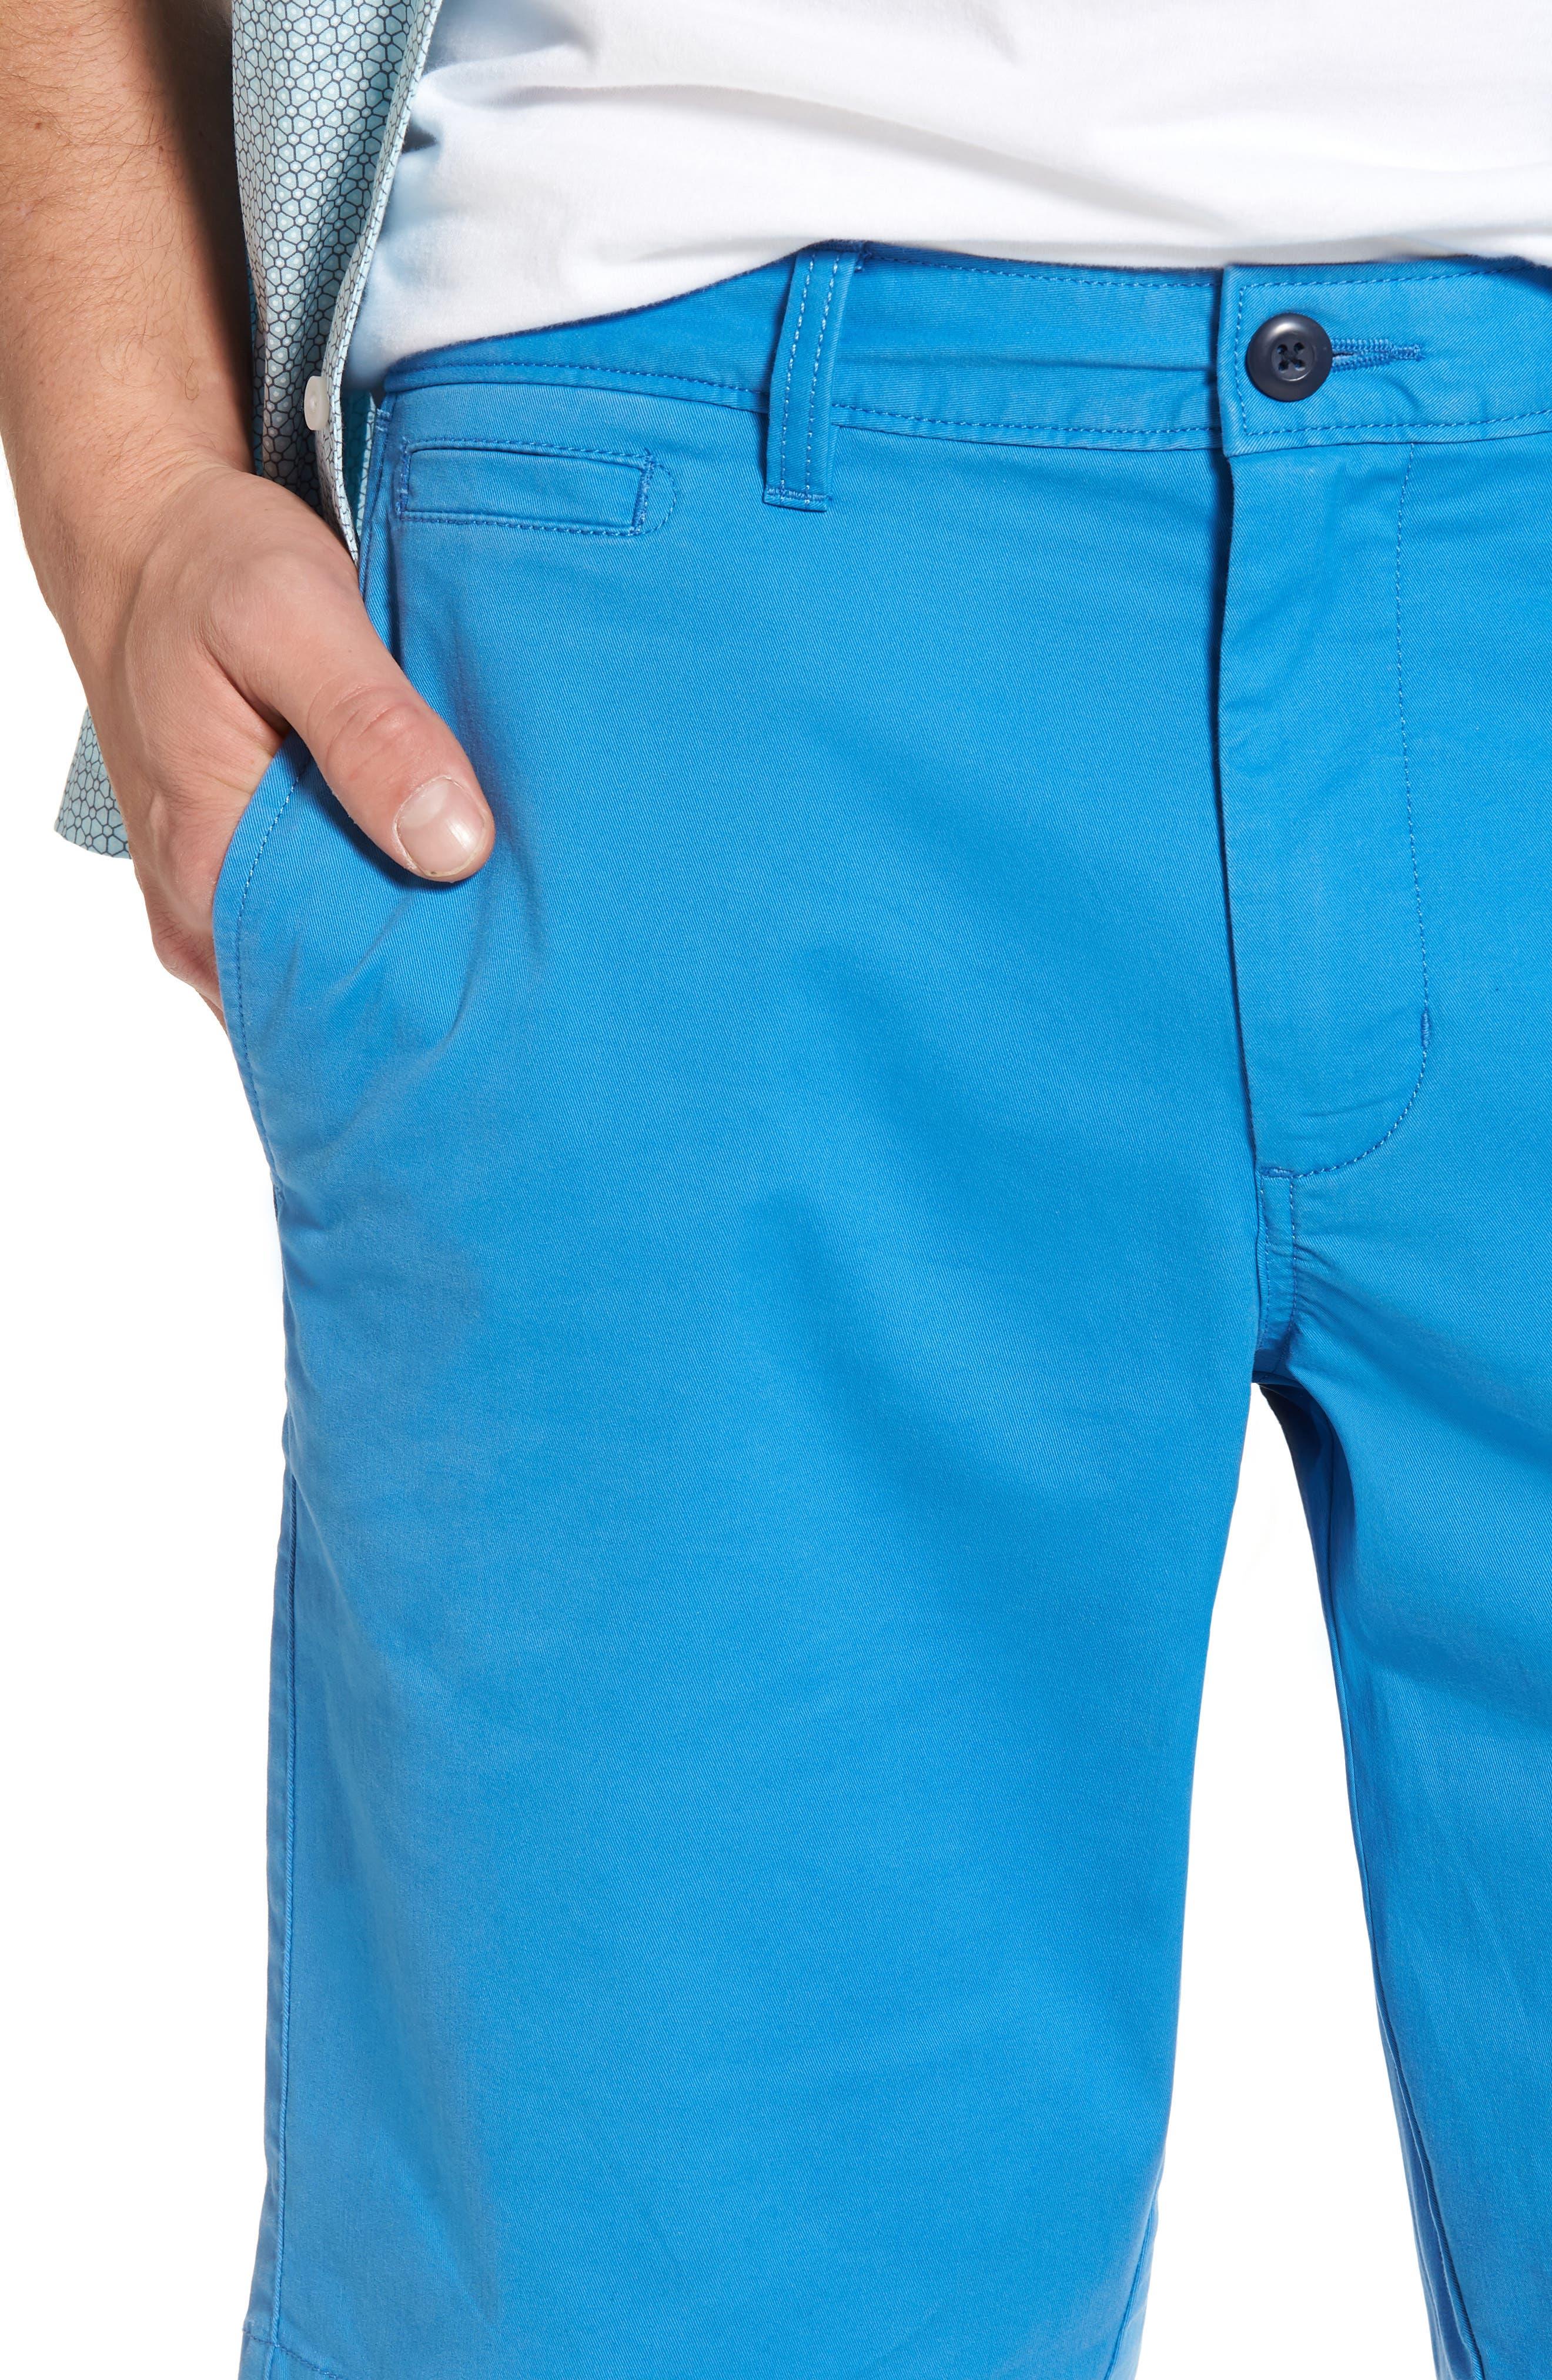 Ballard Slim Fit Stretch Chino 11-Inch Shorts,                             Alternate thumbnail 6, color,                             Blue Camp